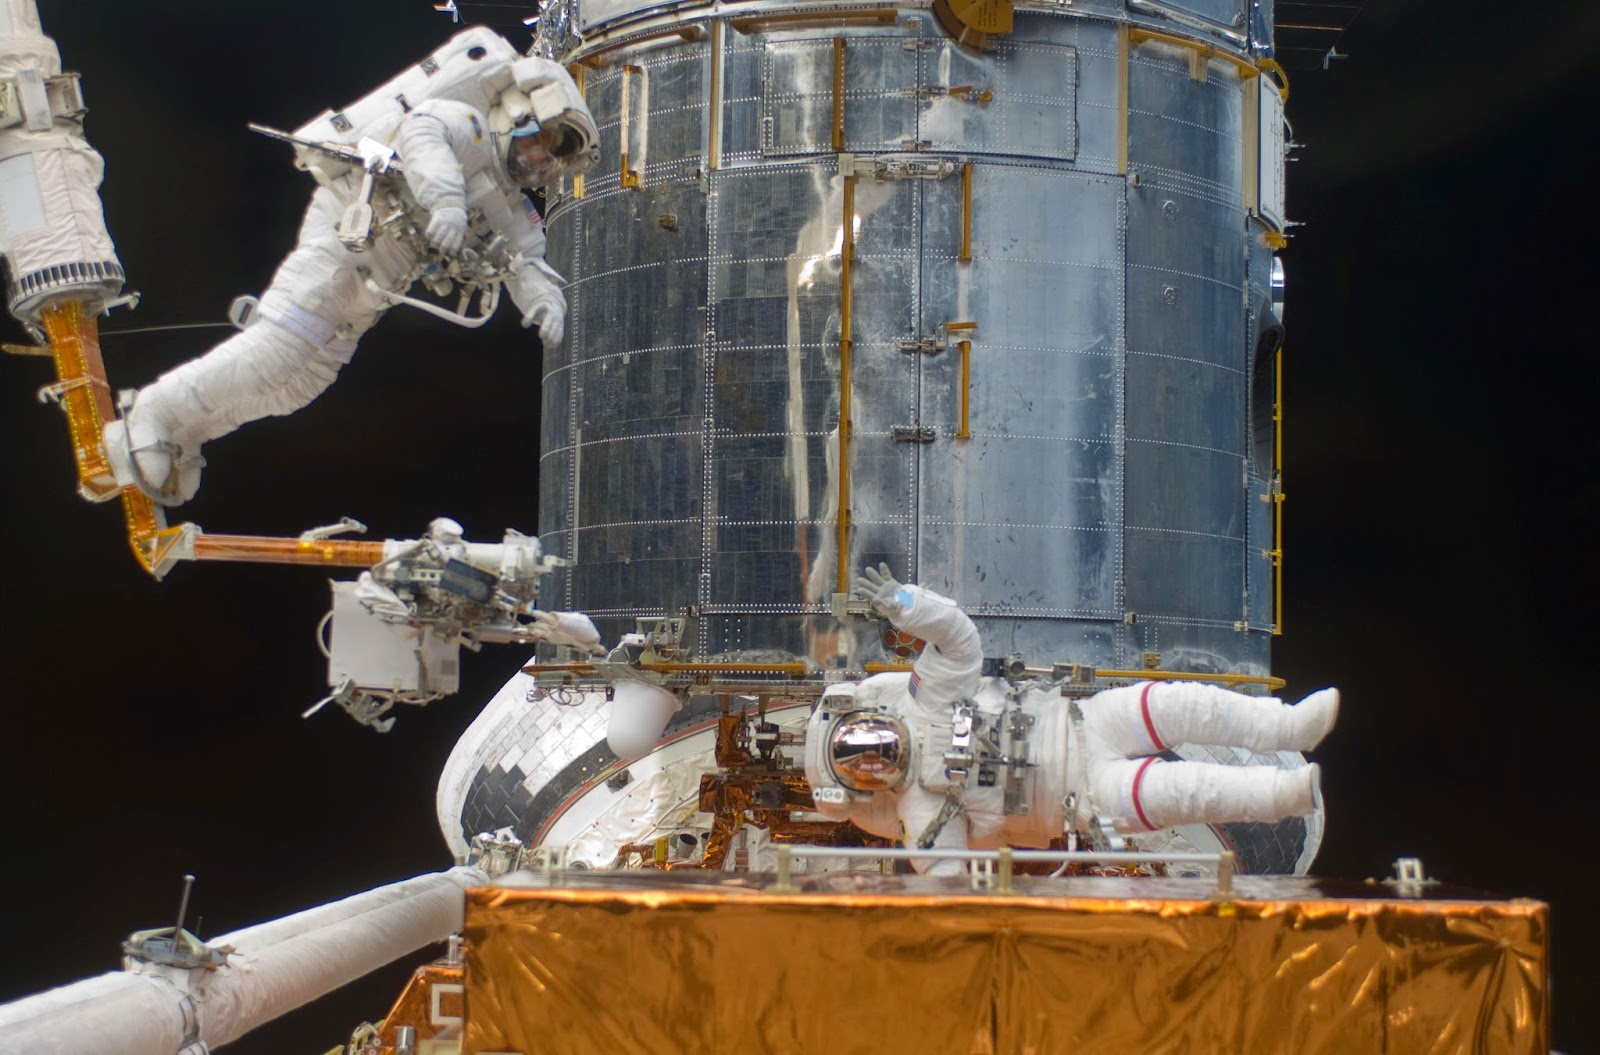 The Hubble Telescope's Quarter-Century of Breakthroughs ...